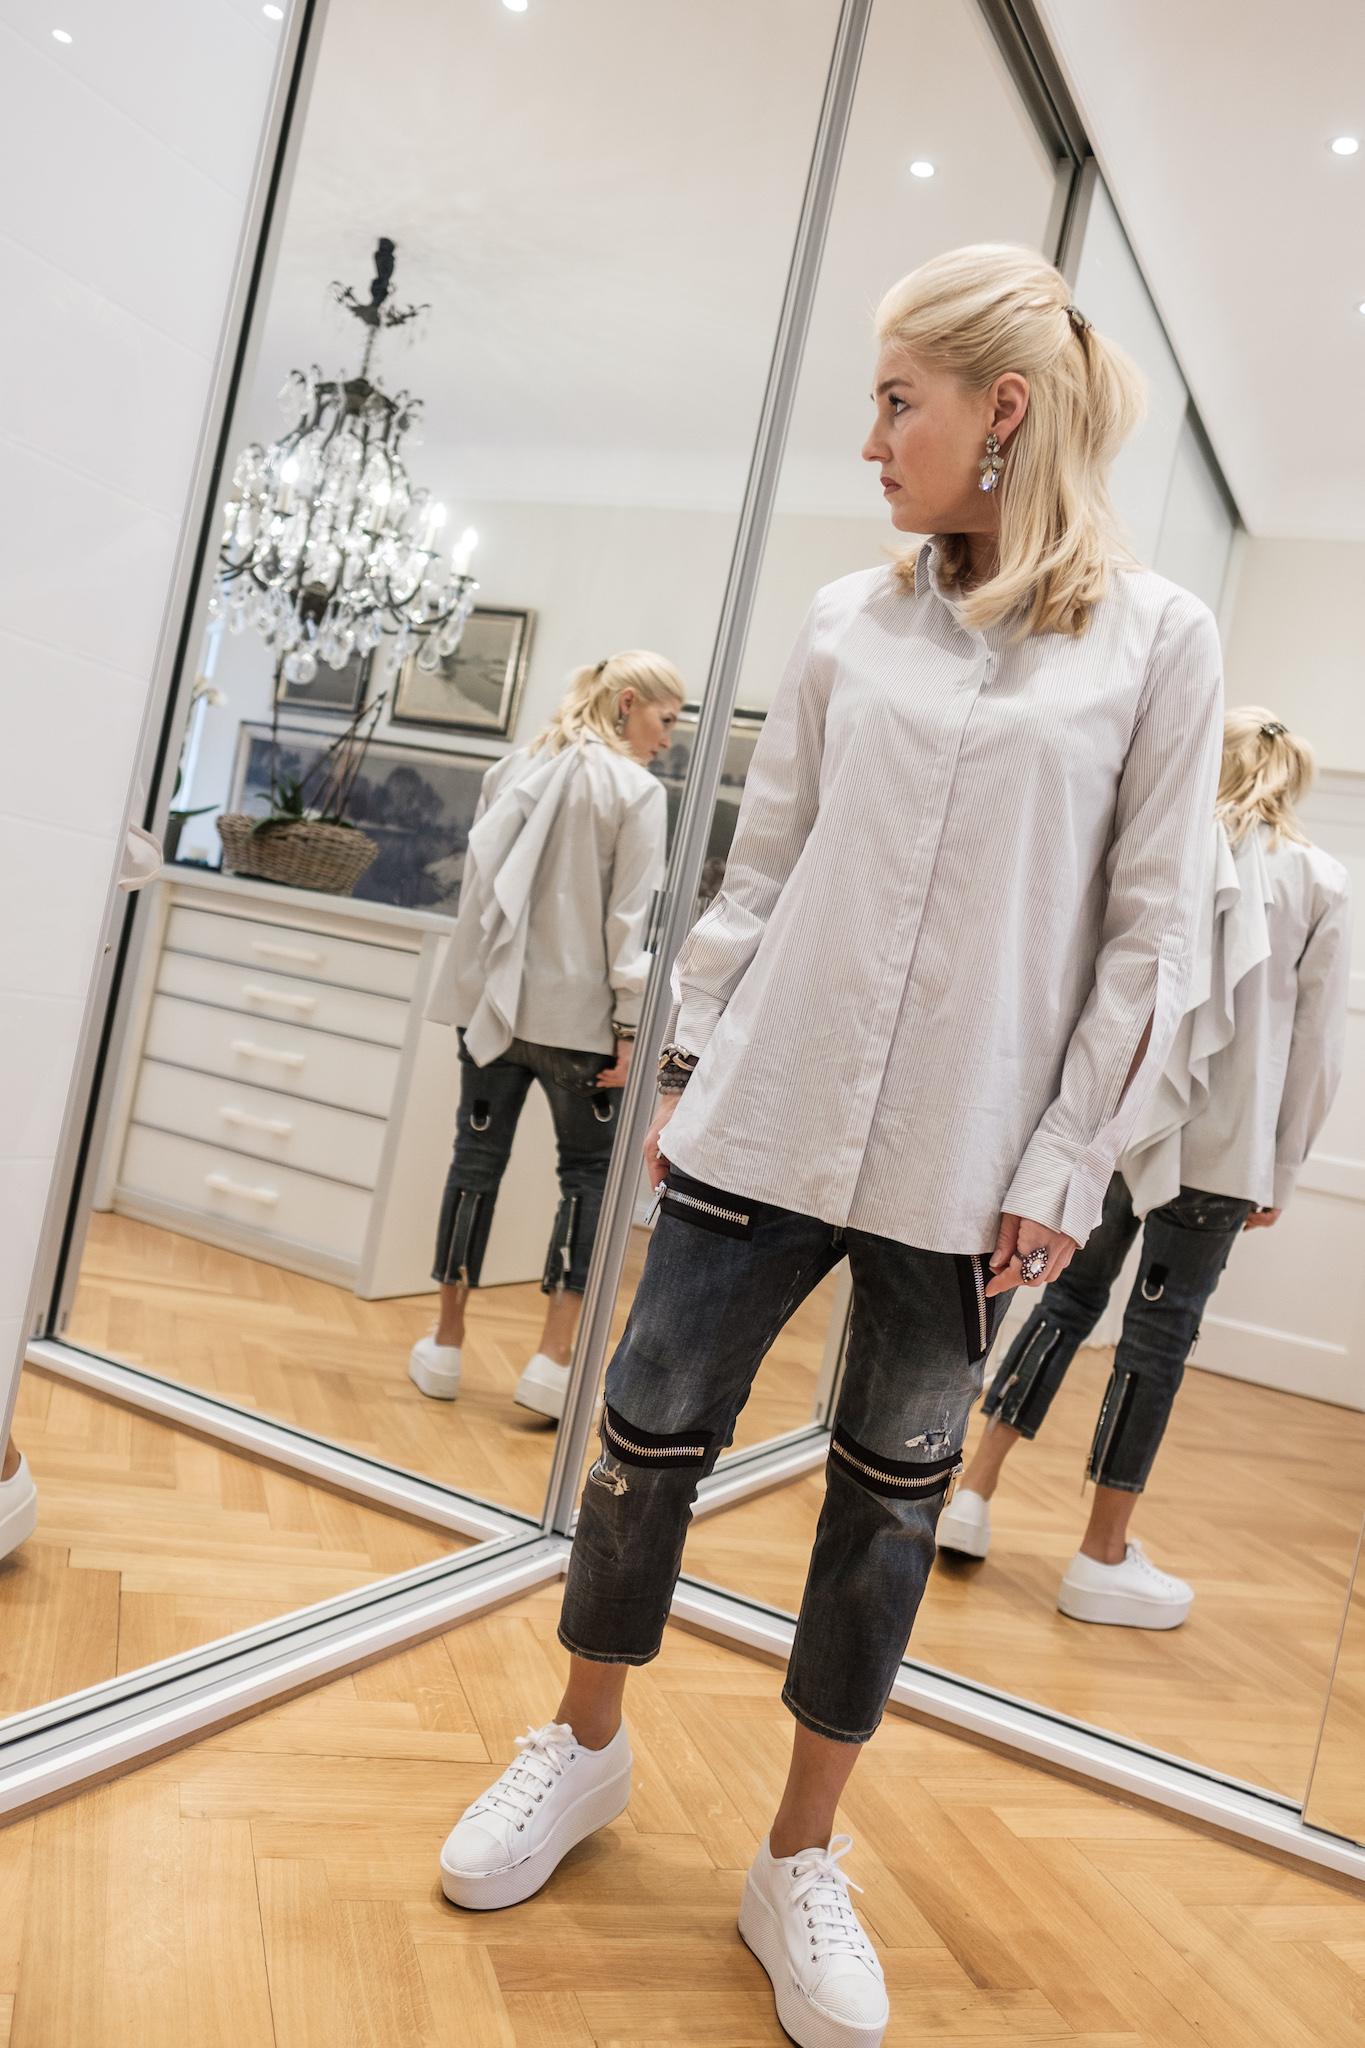 Dorothee Schumacher Hemd gestreift, Dorothee Schumacher Bluse gestreift, Fashion-Blog, Lieblingsstil.com,